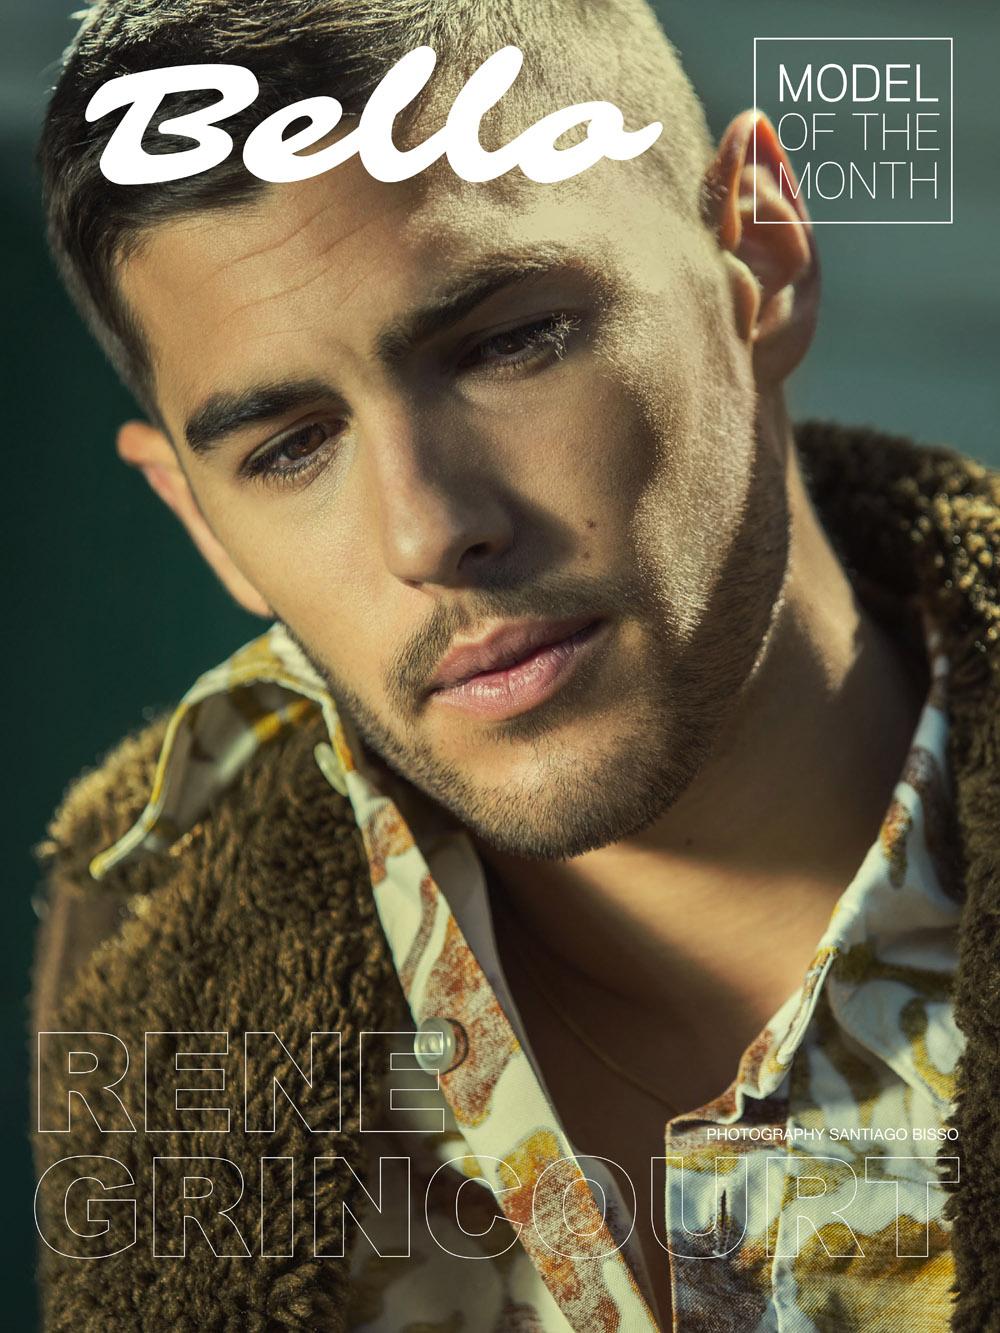 Rene_Grincourt_Bello_LA_Models_00.jpg